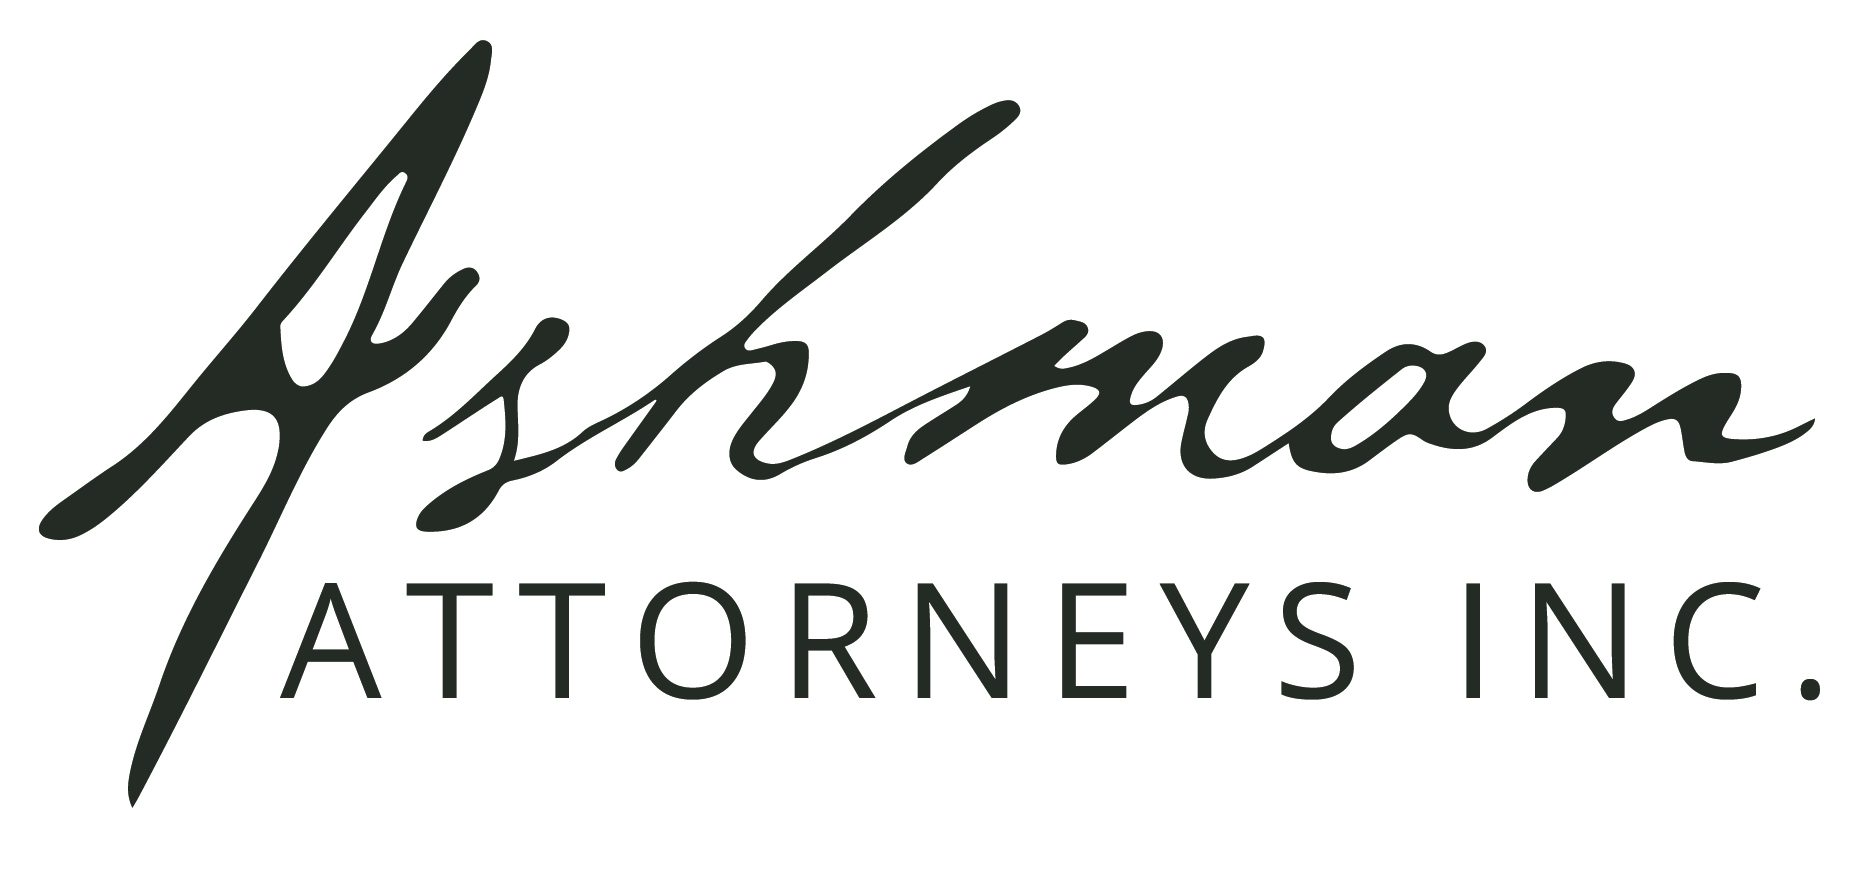 Ashman Attorneys Inc.